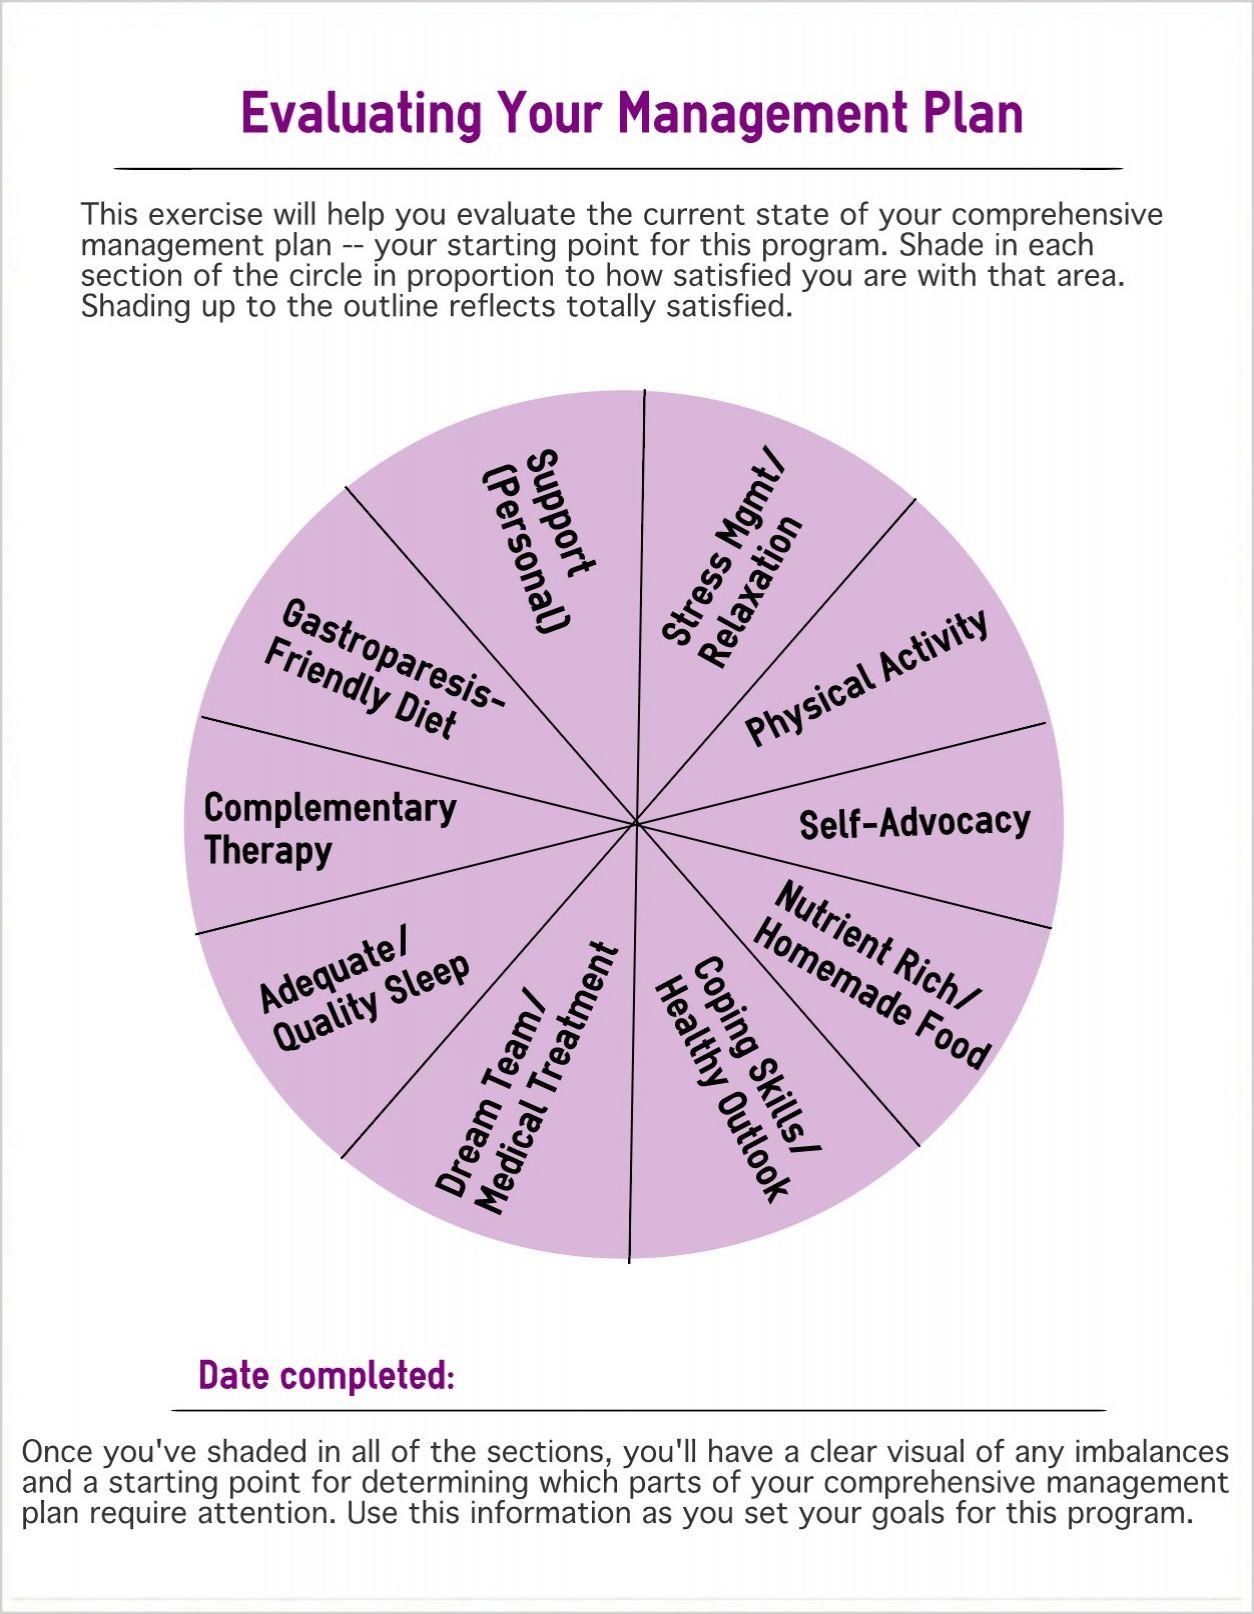 Evaluate Your Management Plan Free Worksheet